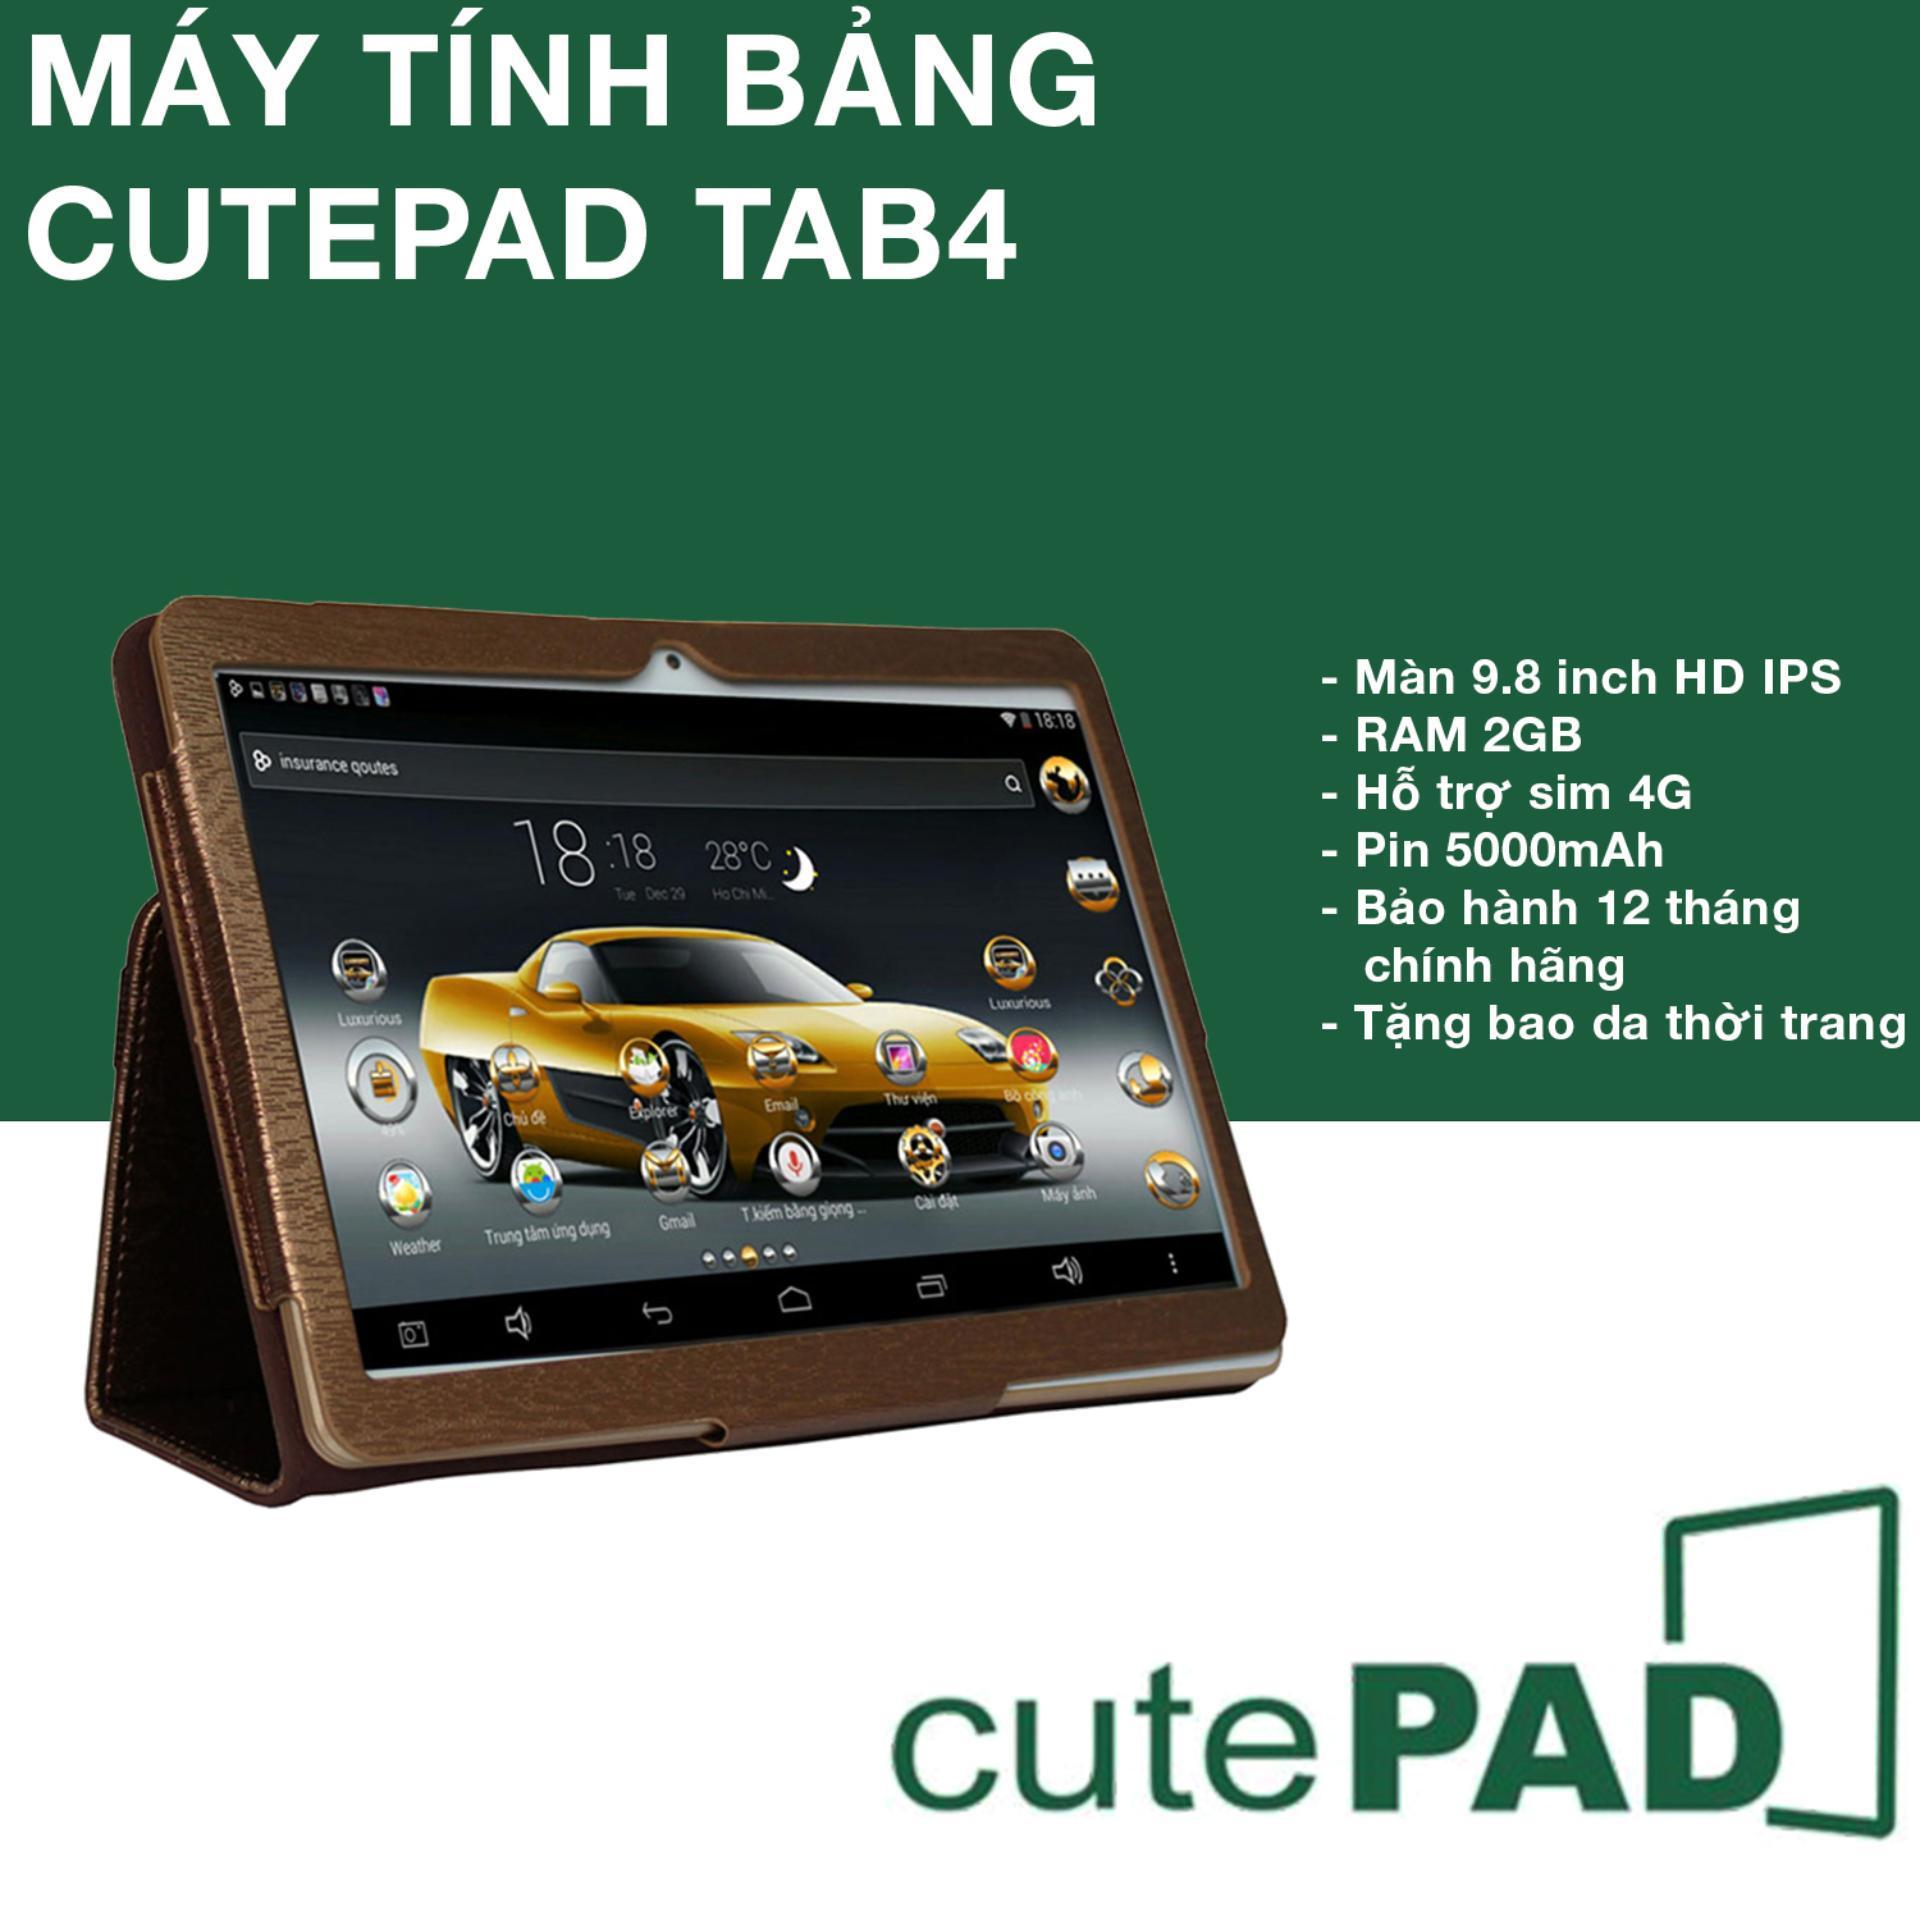 Máy tính bảng cutePAD (2018-Gold) M9601 Wifi/3G 16GB, Ram 2GB, 9.6